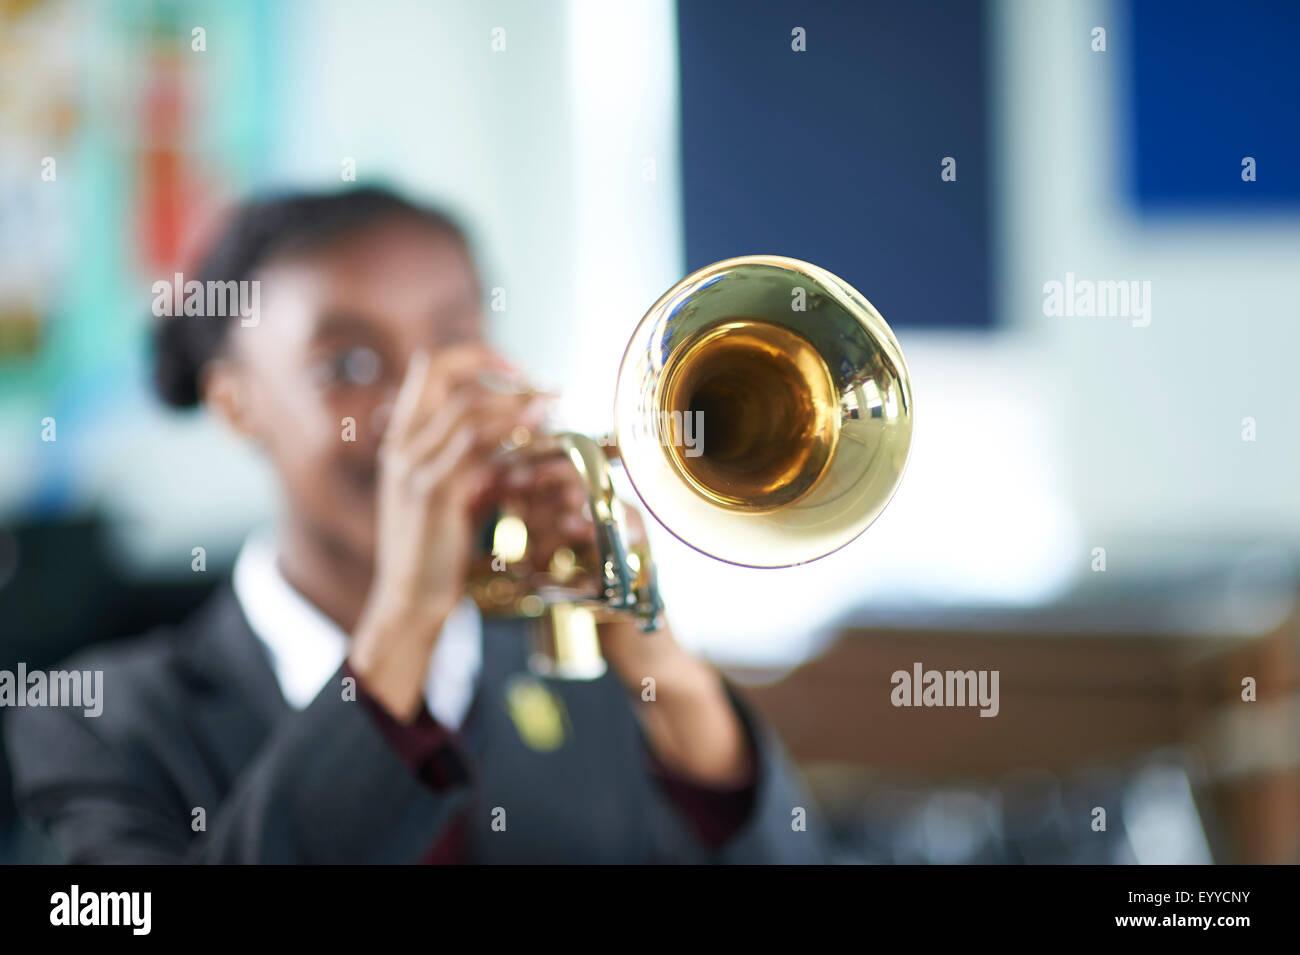 trumpet playing - Stock Image